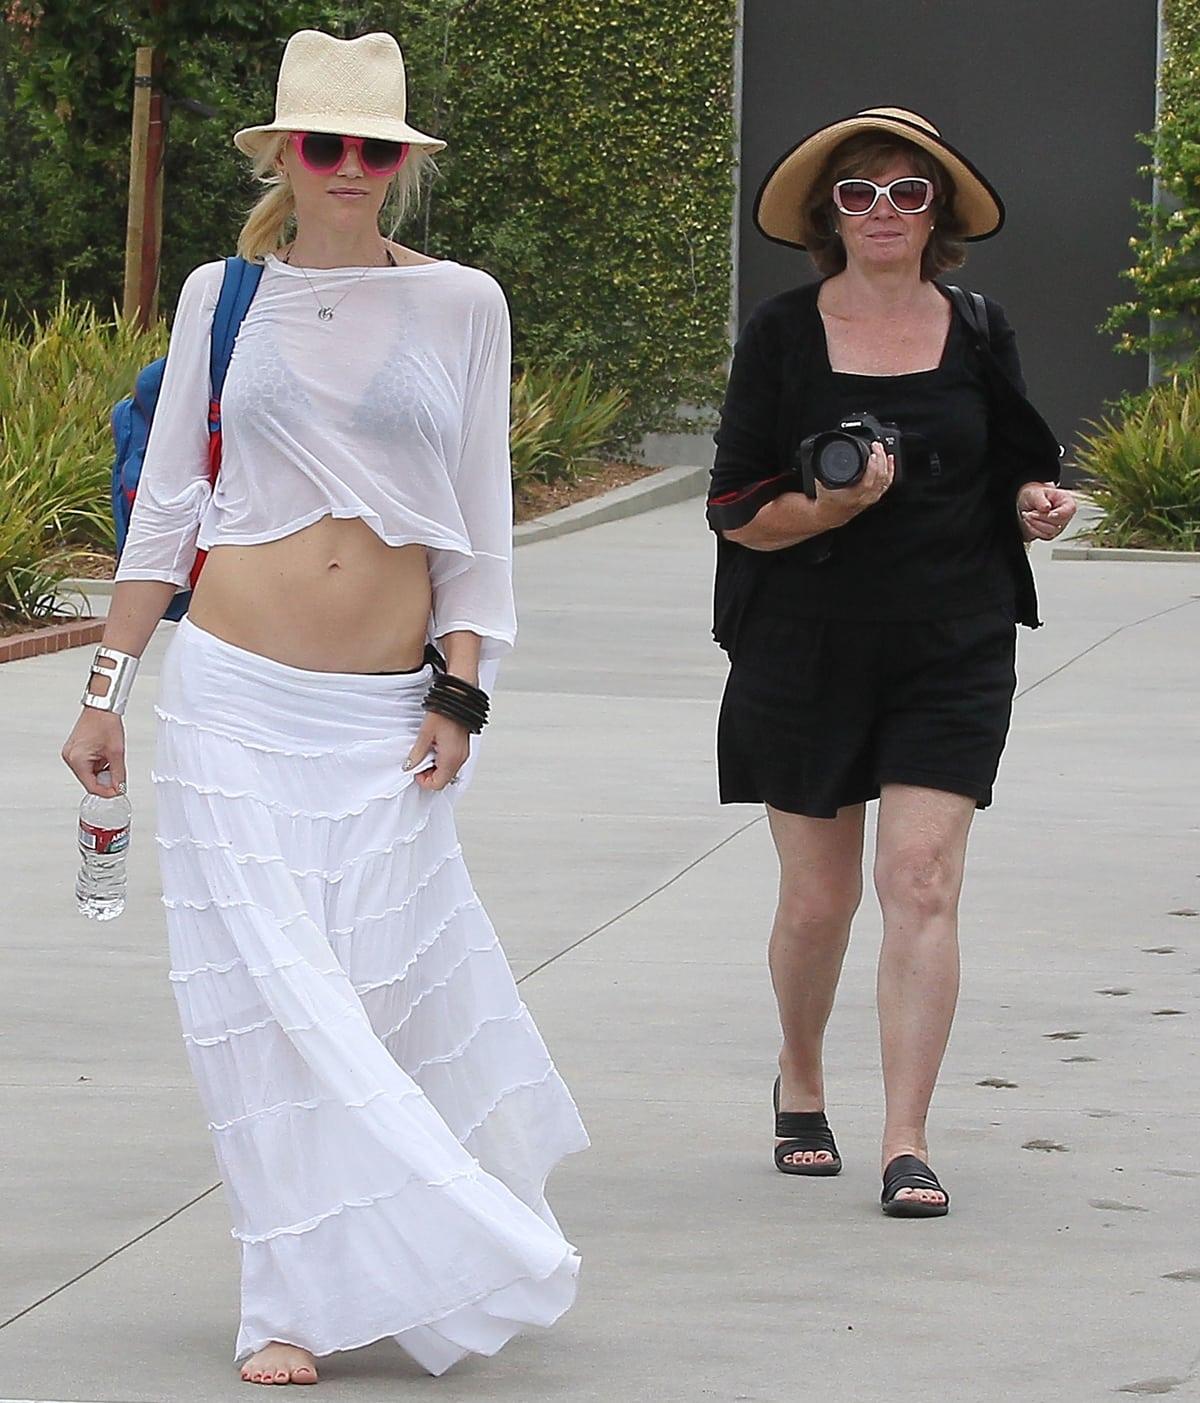 Patti Flynn with her daughter Gwen Stefani in Santa Monica